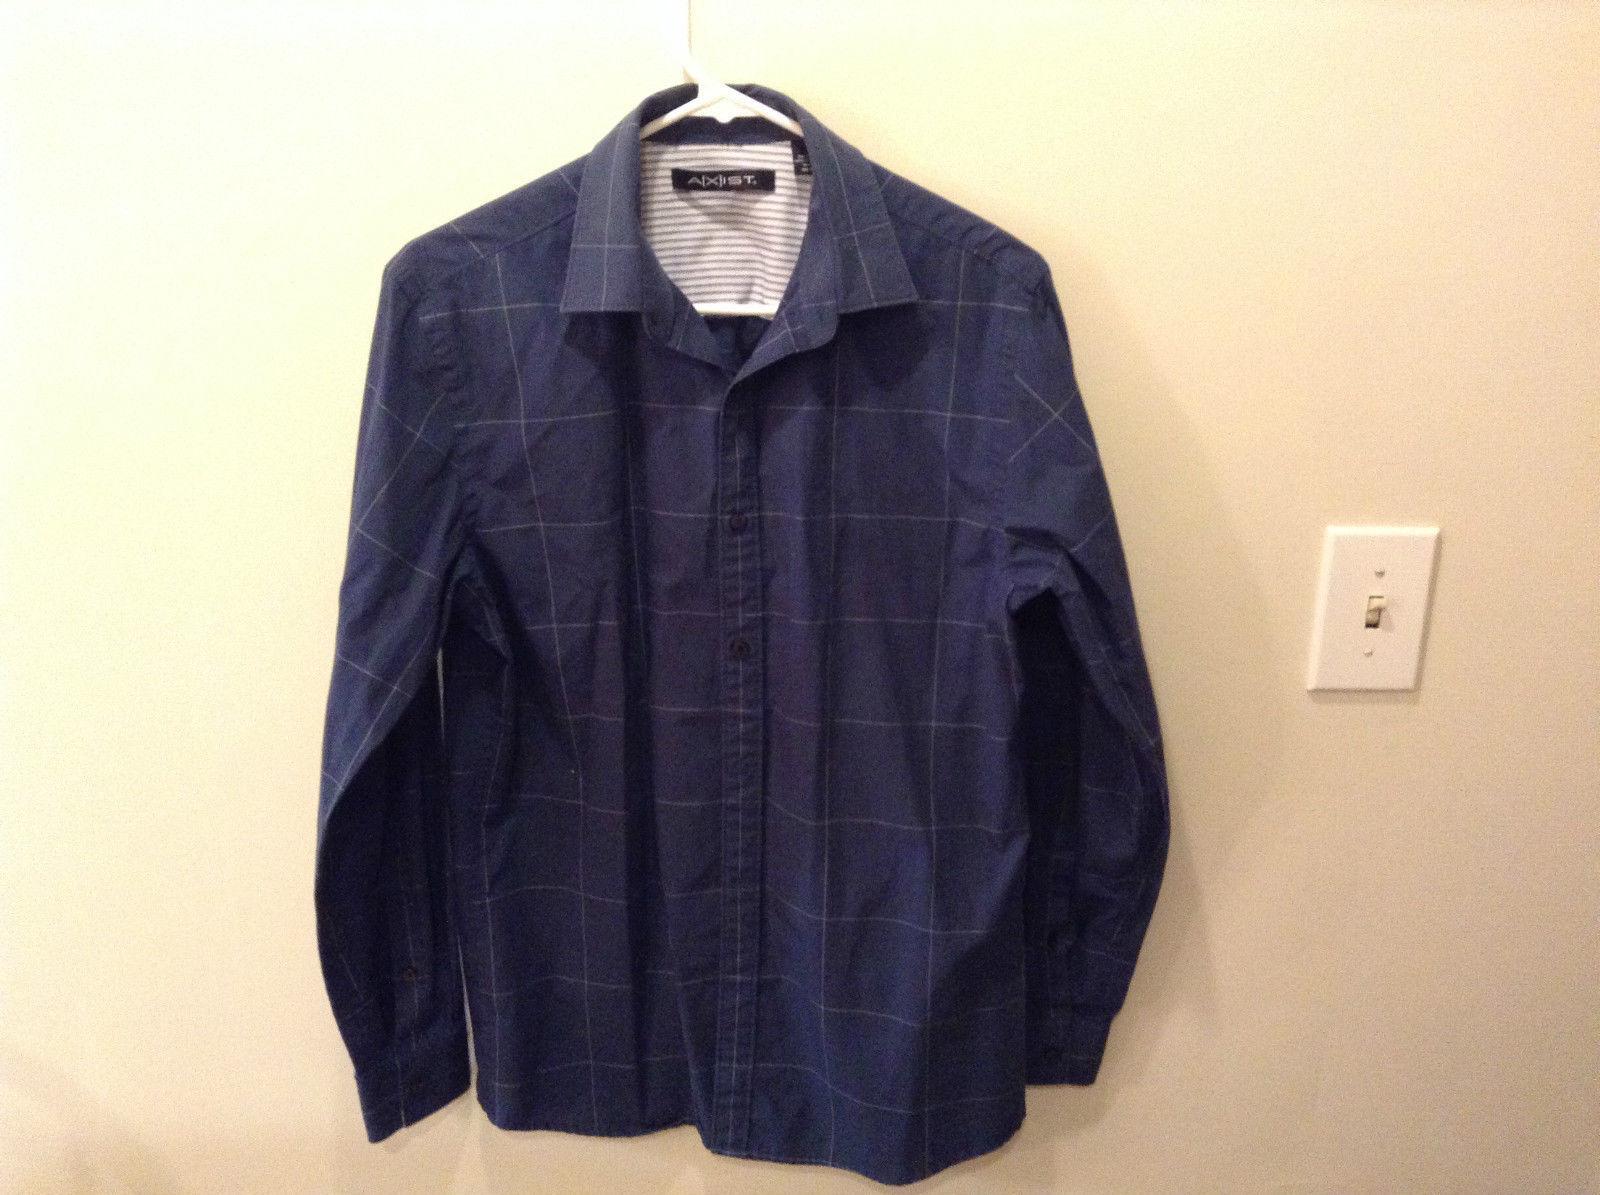 Axist Dark Navy Blue White Box Pattern Button Up Dress Shirt Measurements Below